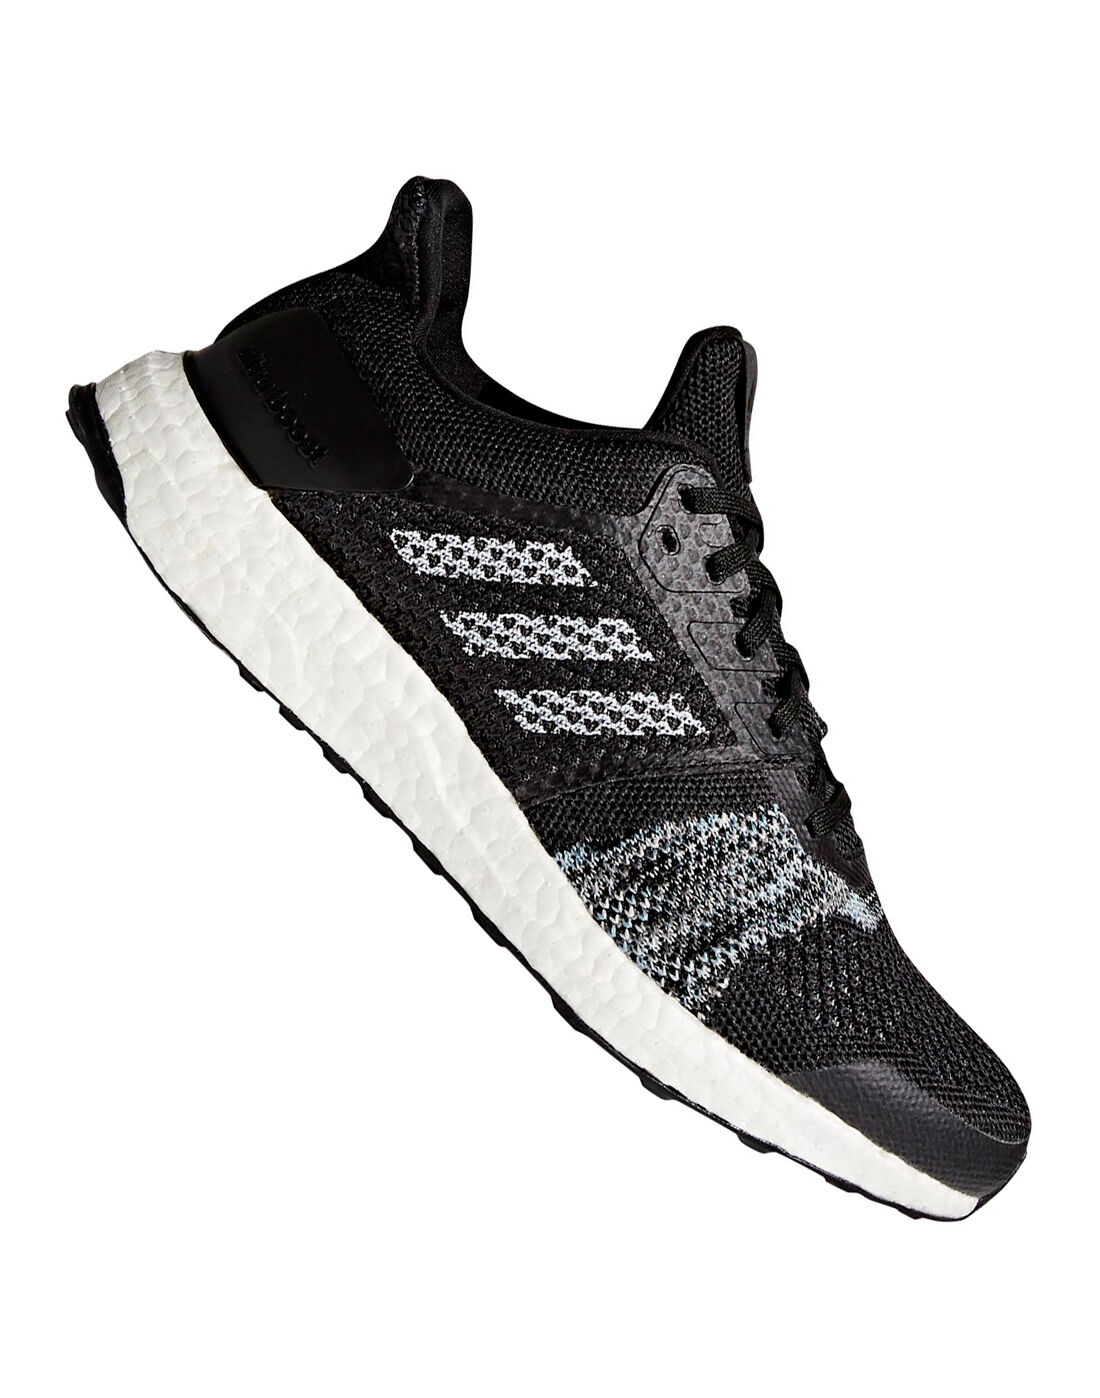 adidas ultra boost style, Adidas Ultra Boost ST Shoes